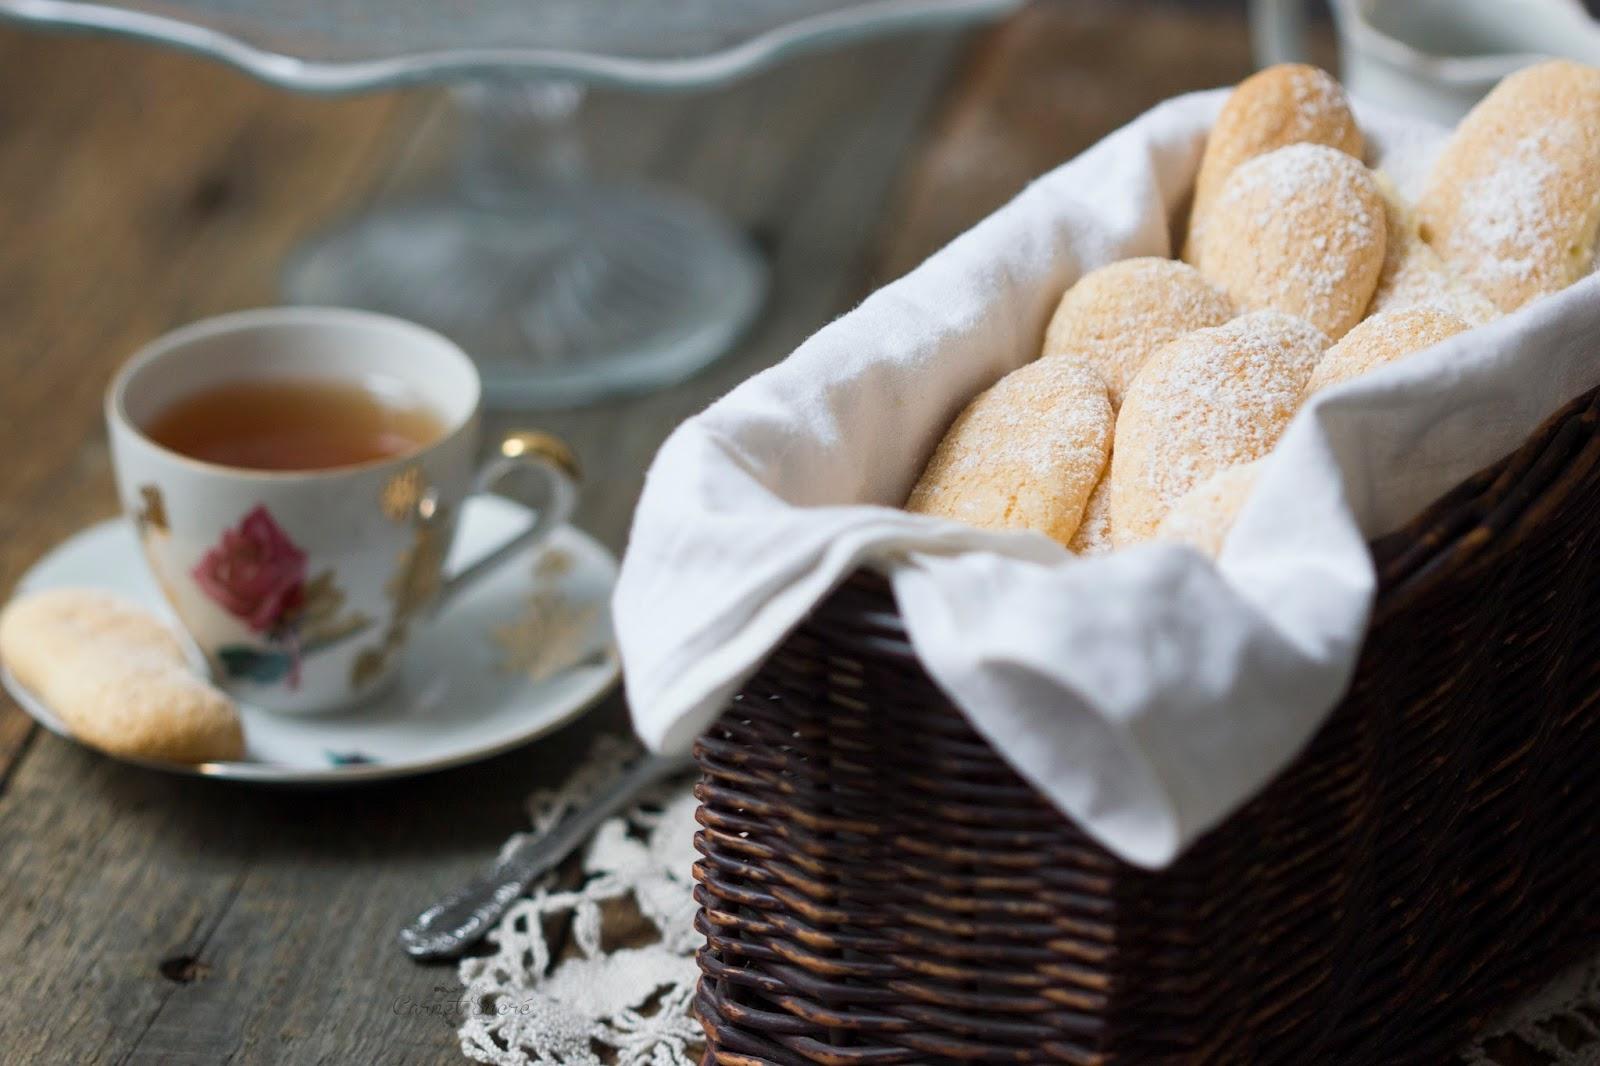 http://carnet-sucre.blogspot.com/2017/02/biscuit-cuillere.html